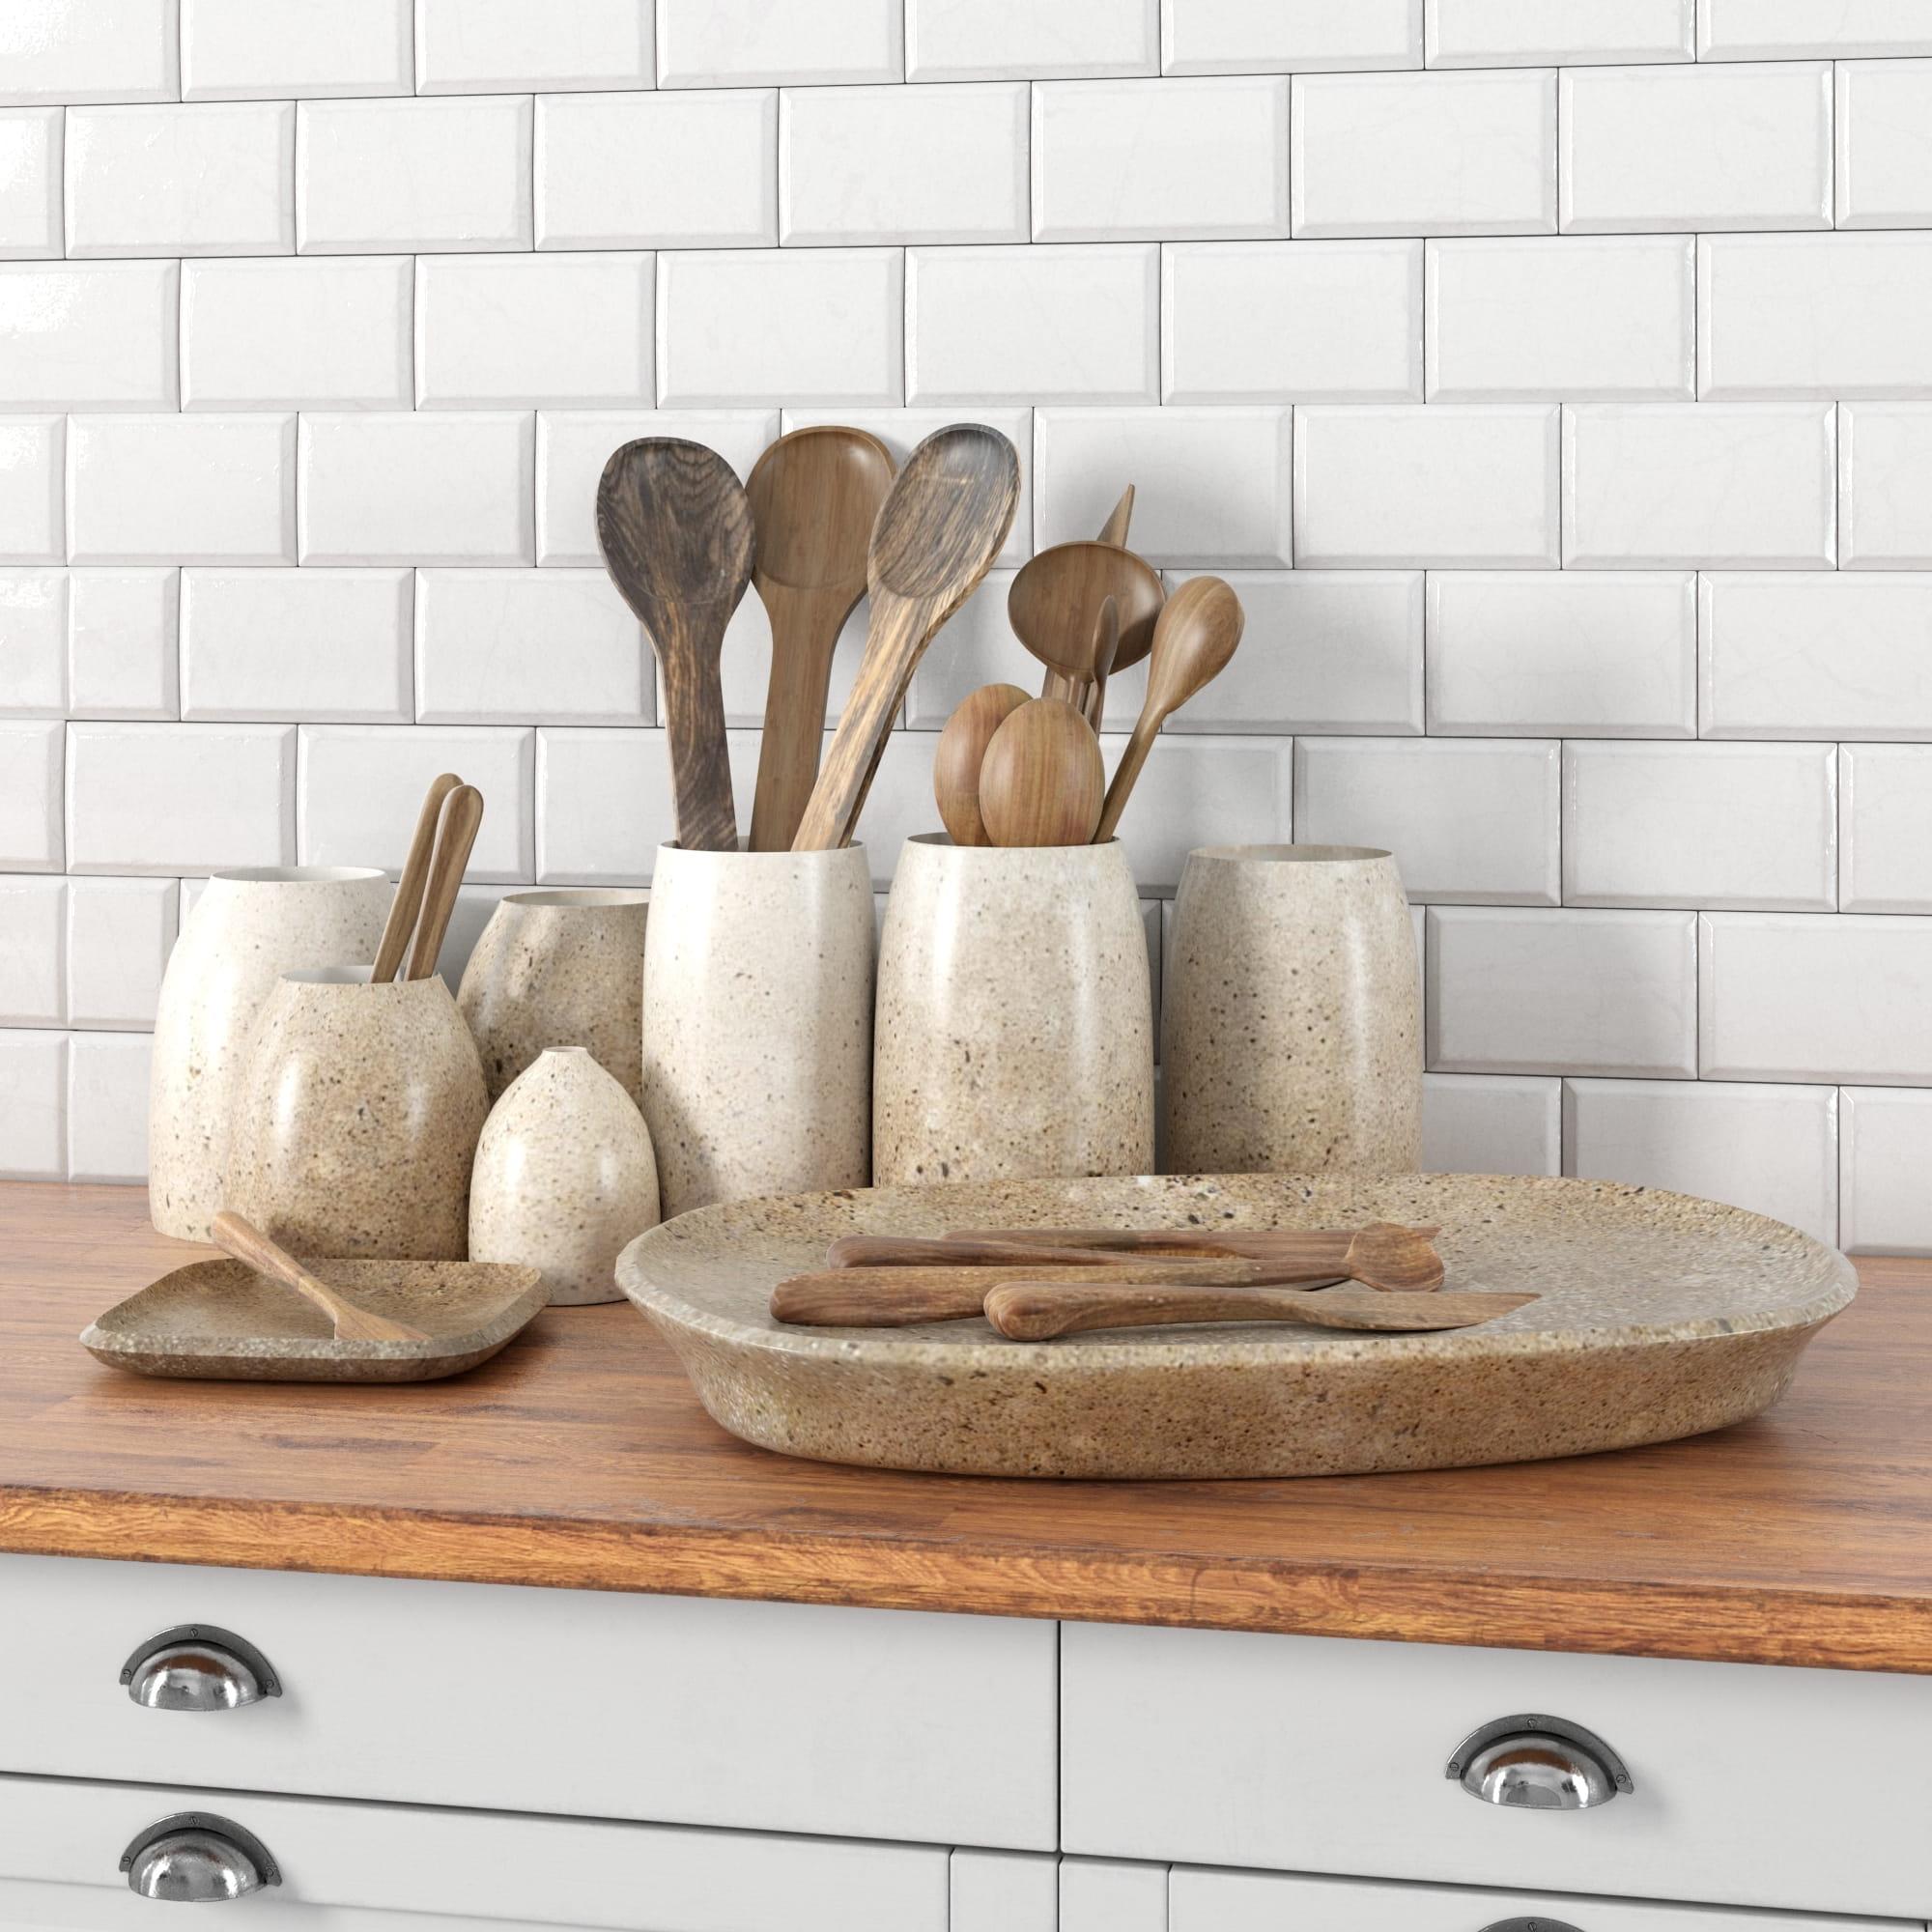 kitchen props 28 AM231 Archmodels